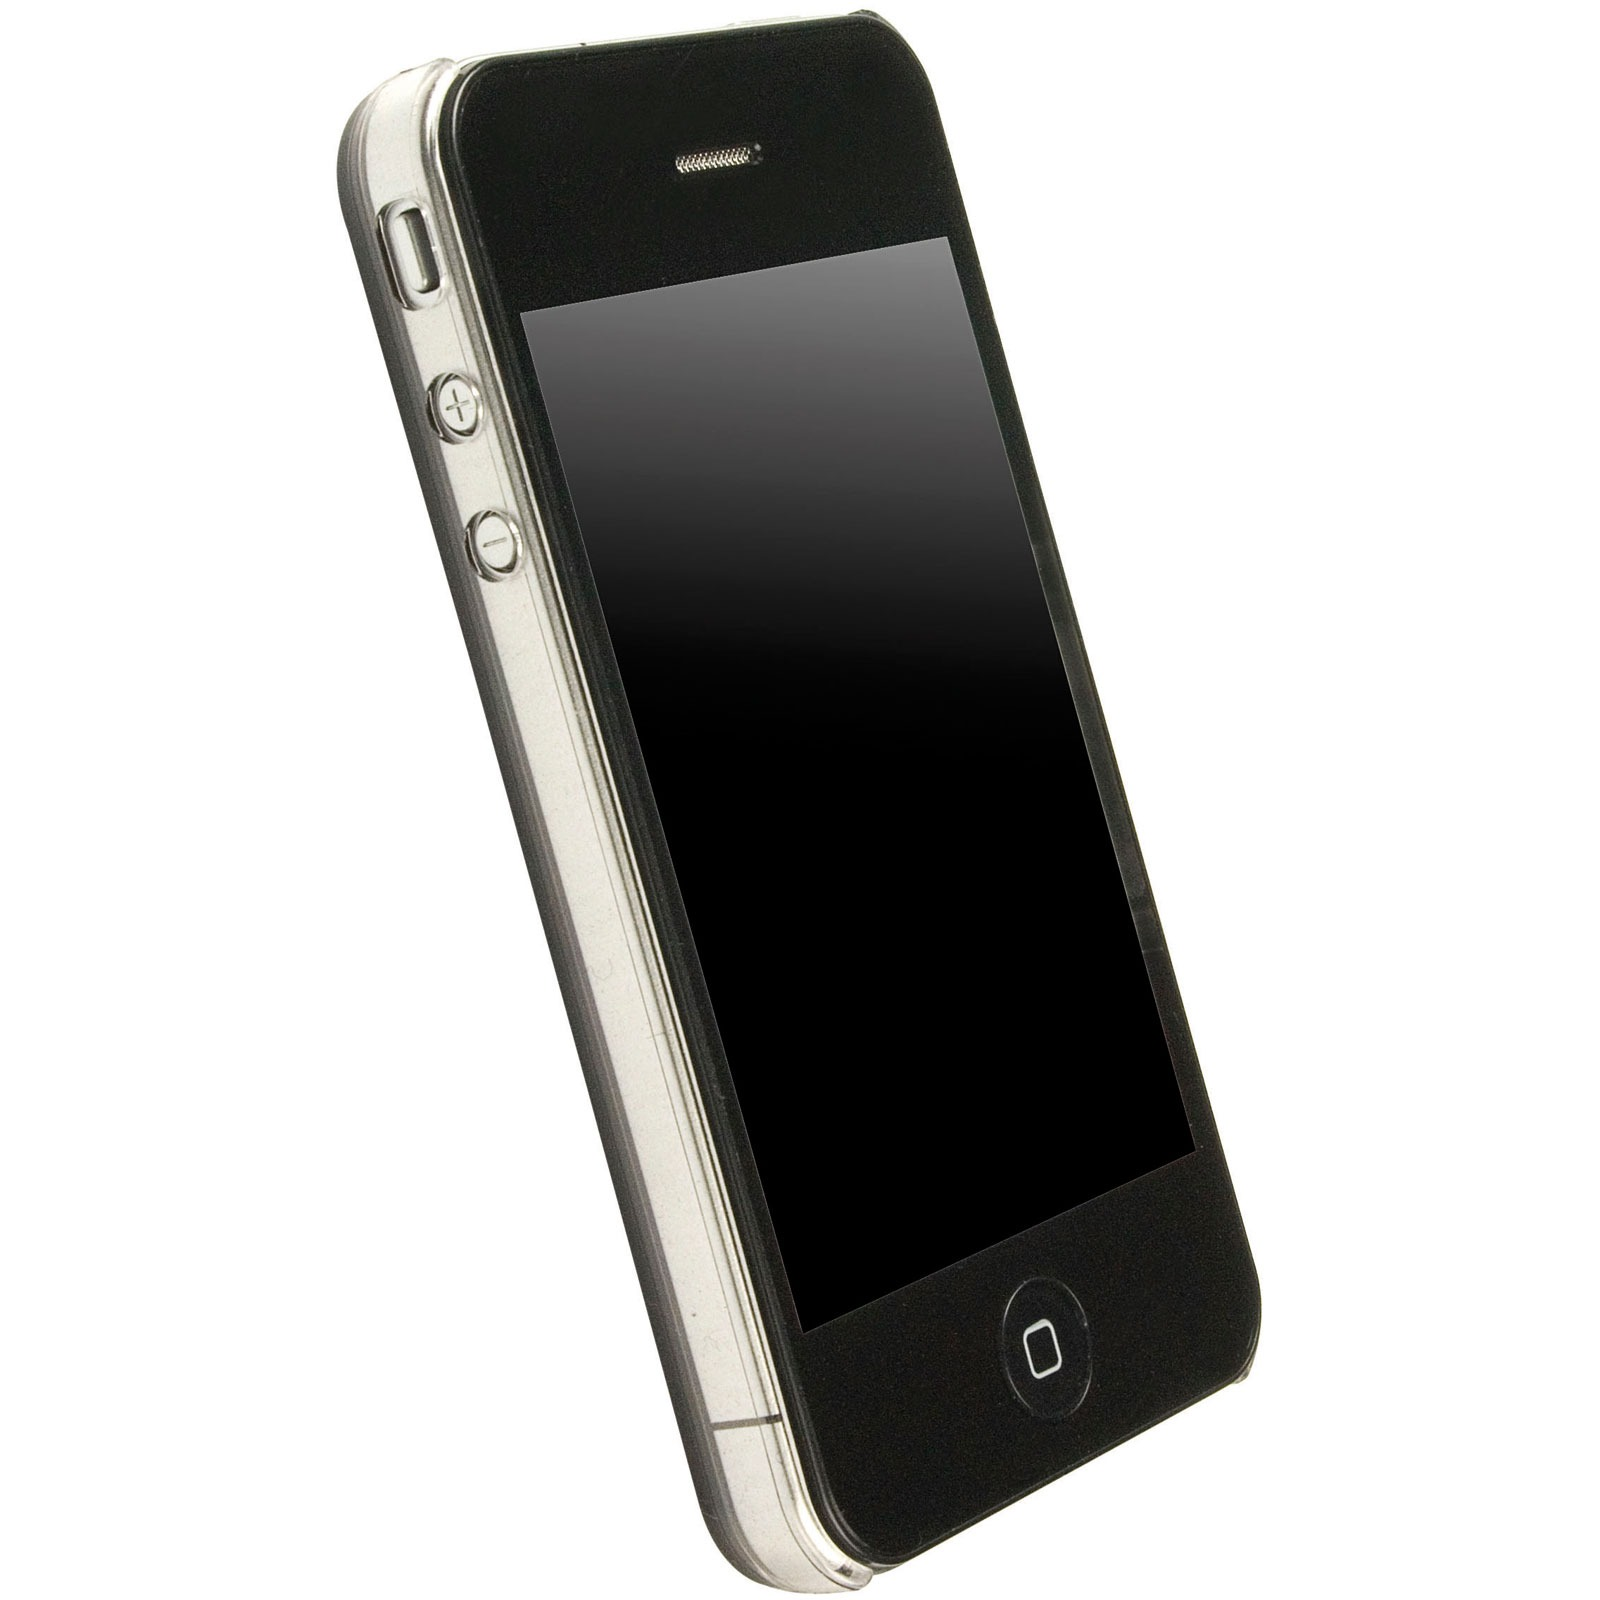 Etui téléphone Krusell Luna Undercover Marron Krusell Luna Undercover Marron - Coque pour iPhone 4 aspect cuir